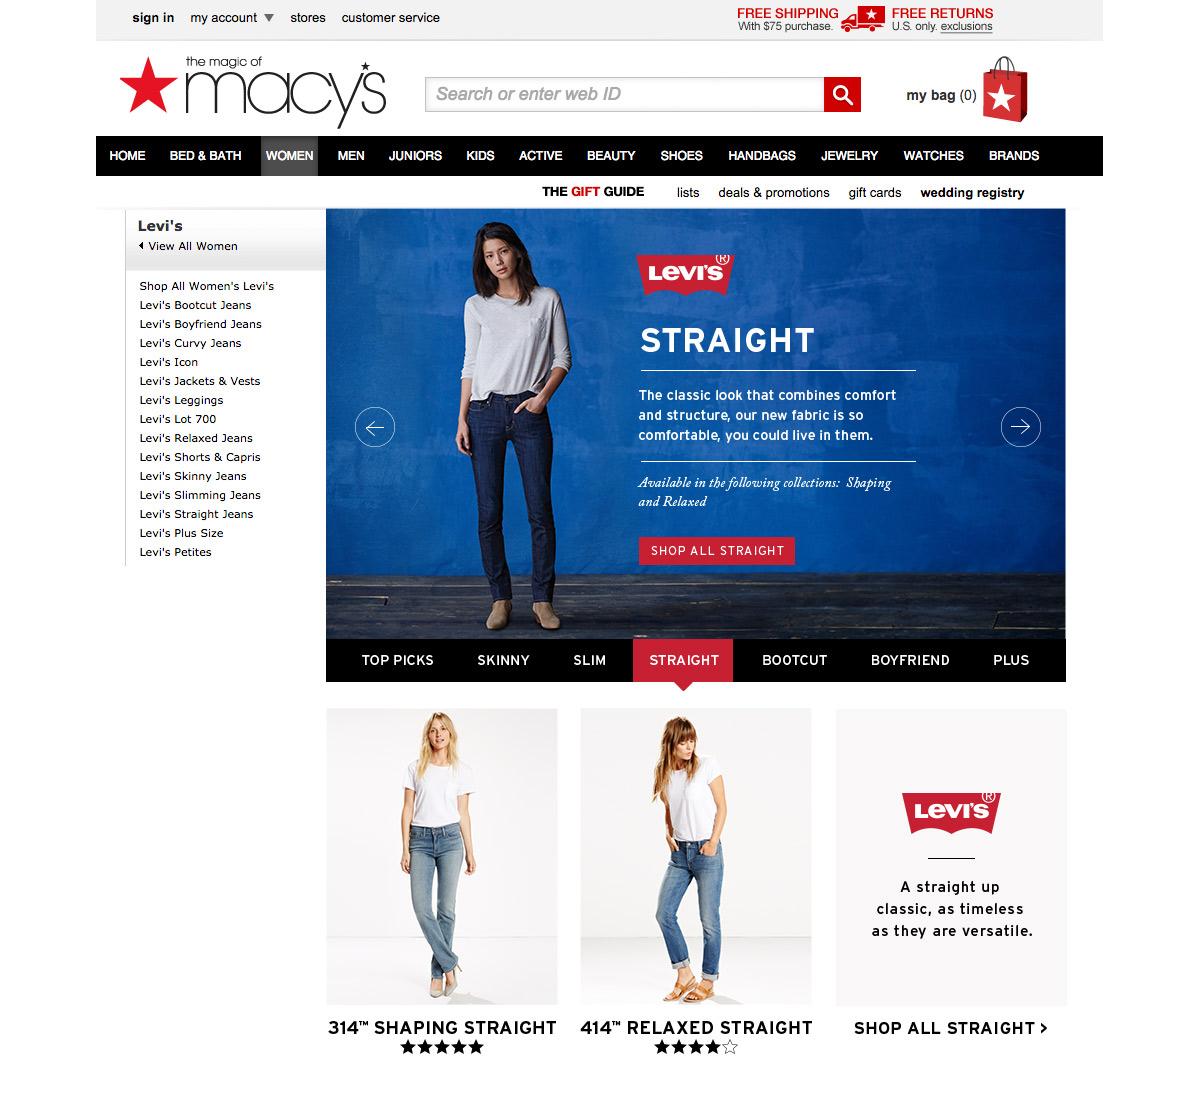 15LEV1005_Macys_BrandShop_Spring15_AL_R4_straight